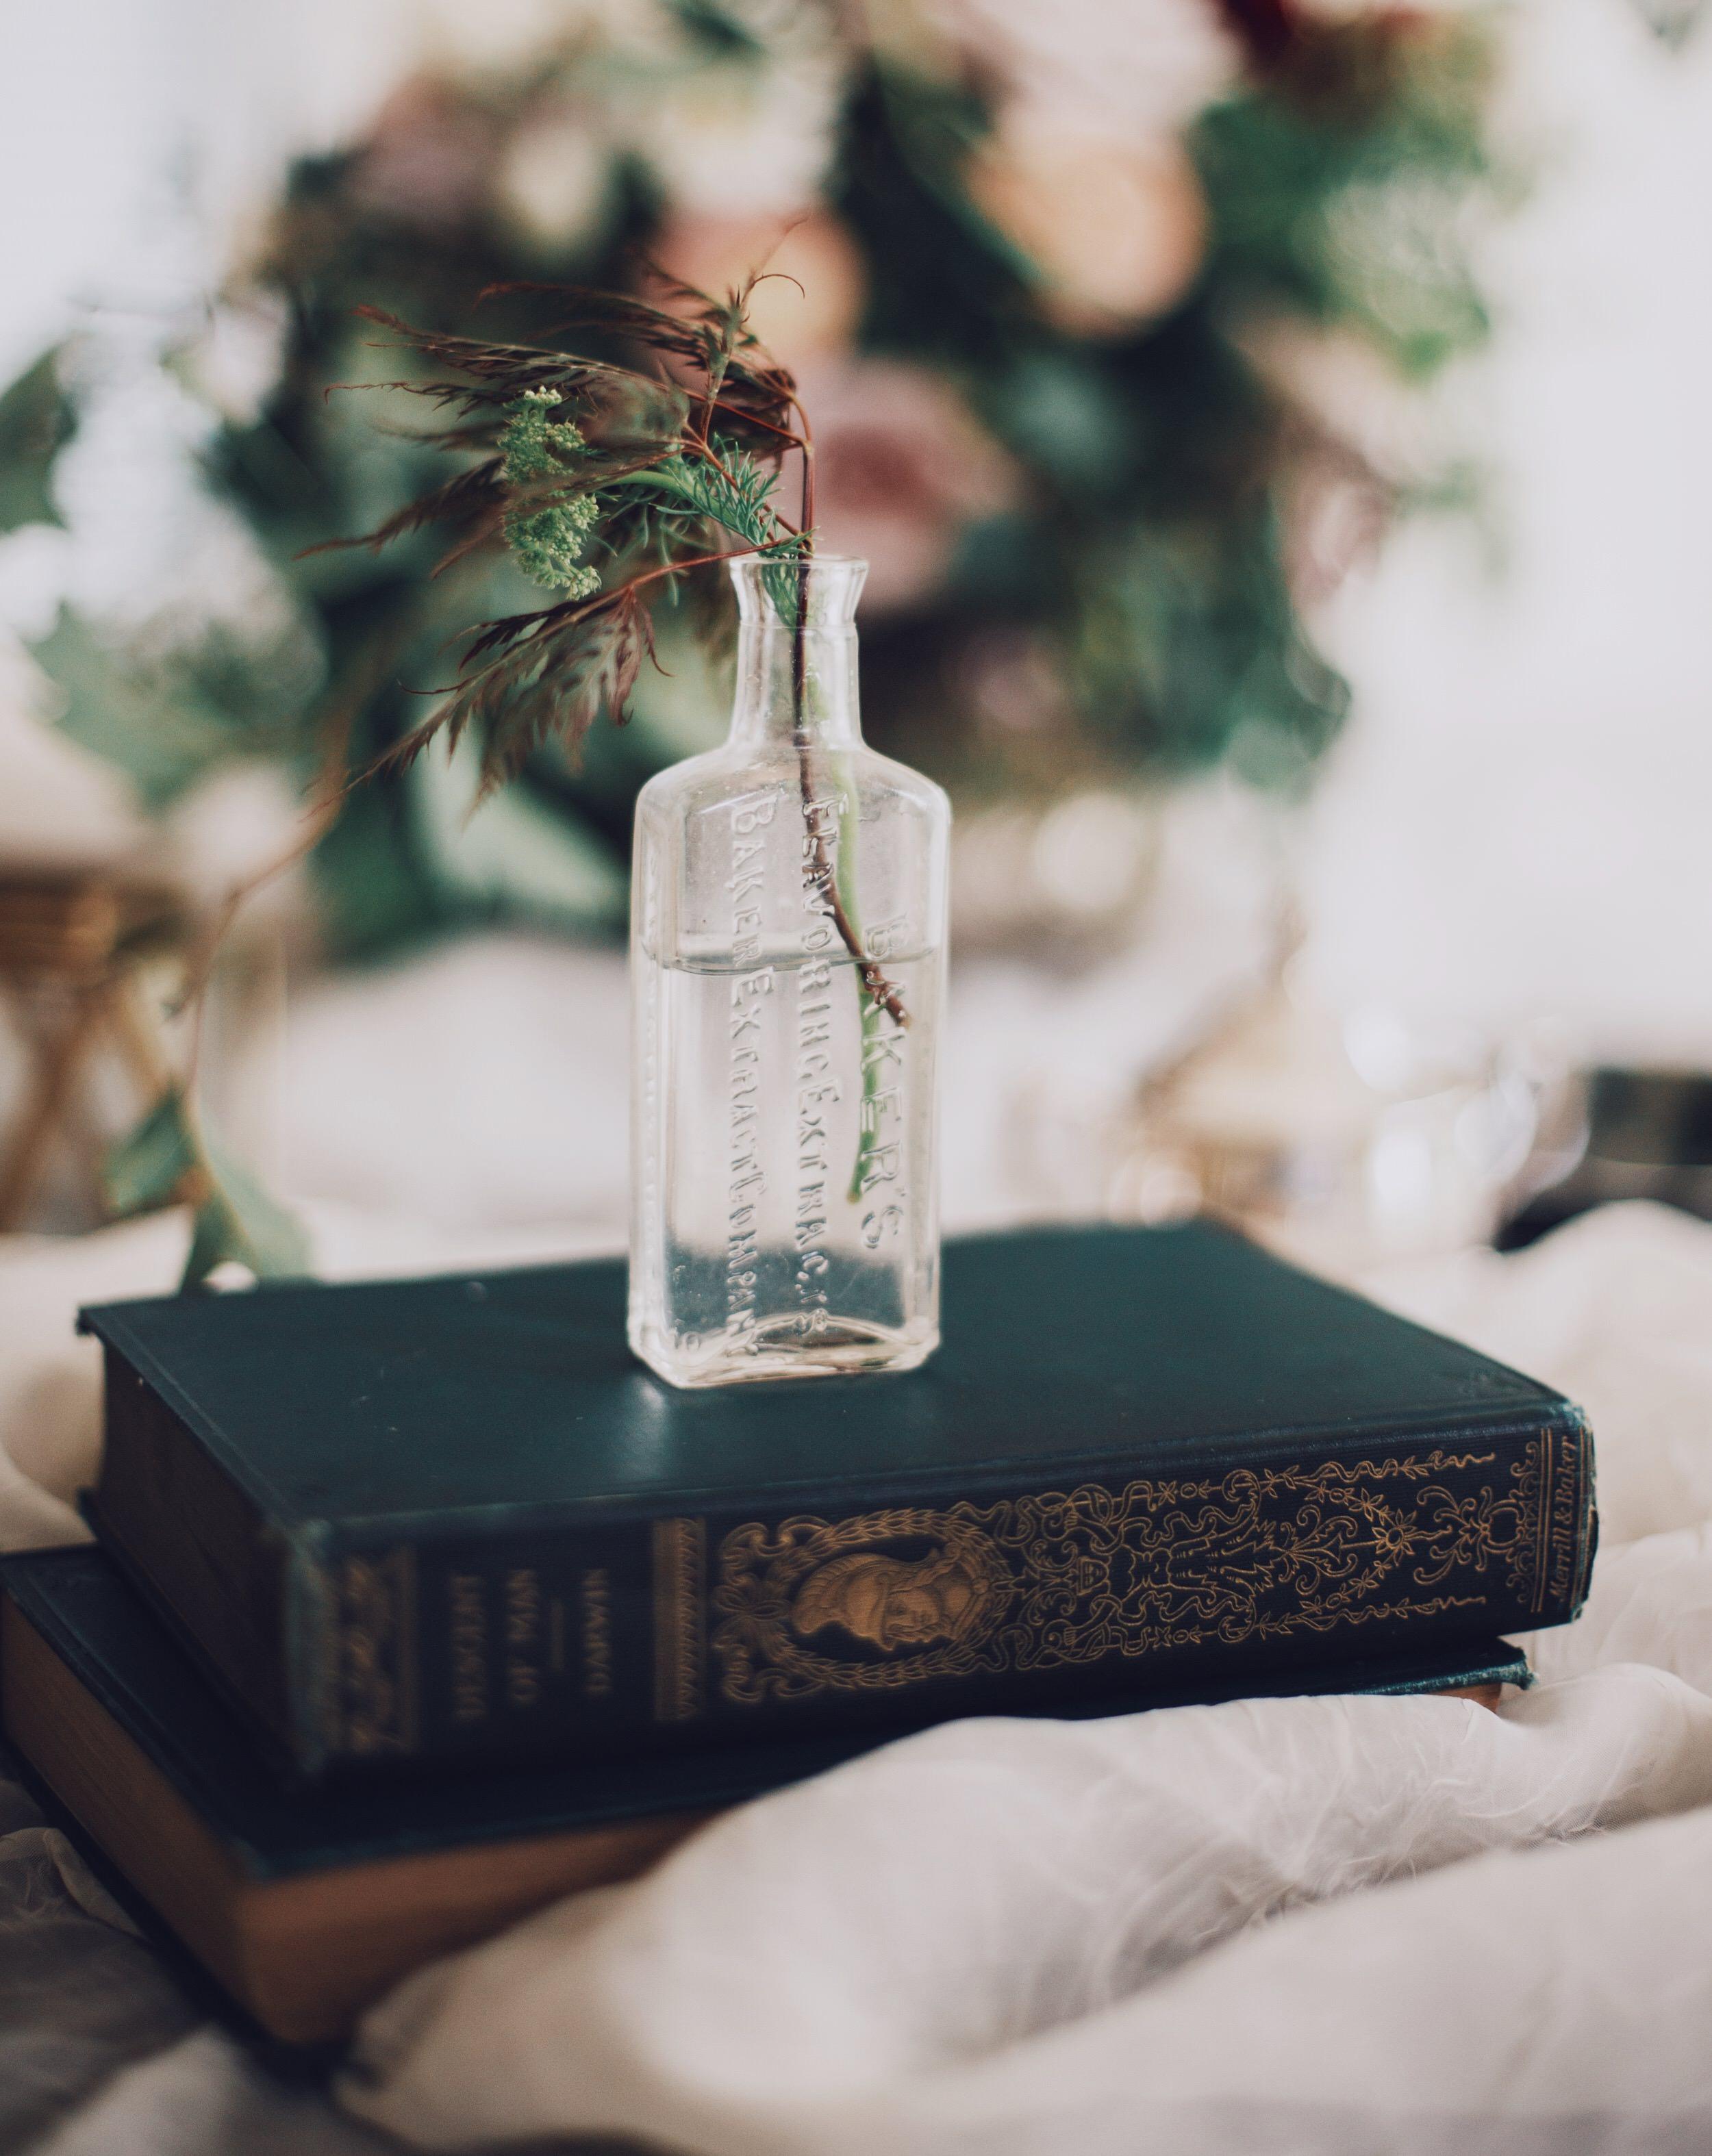 Plant in a Glass Bottle